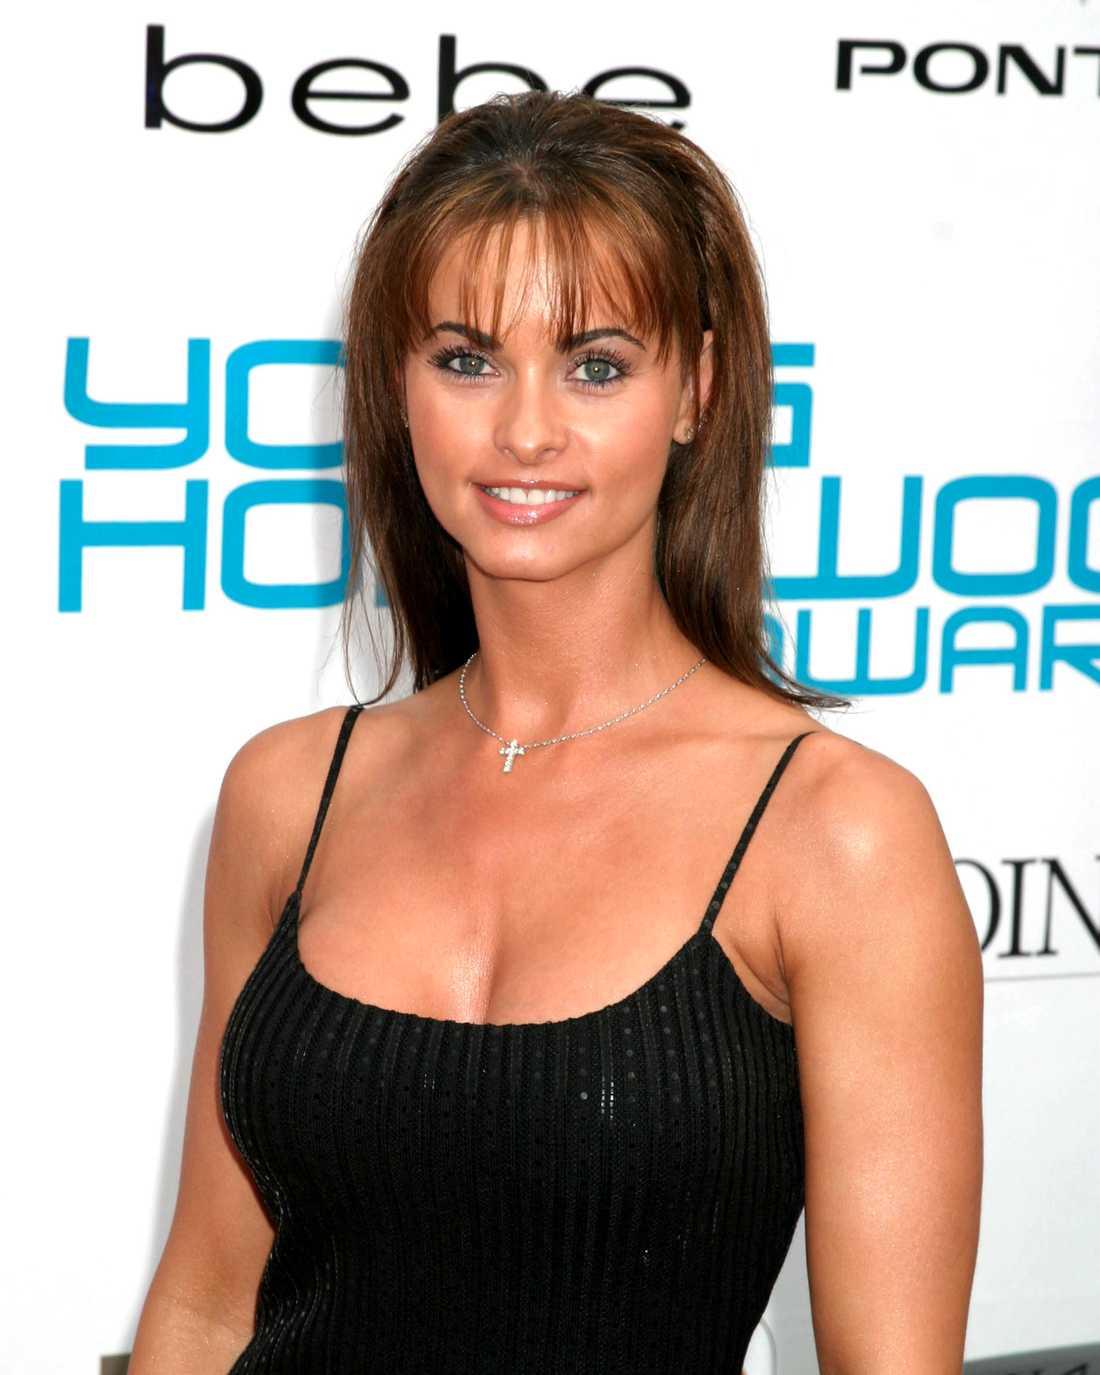 Playboymodellen Karen McDougal